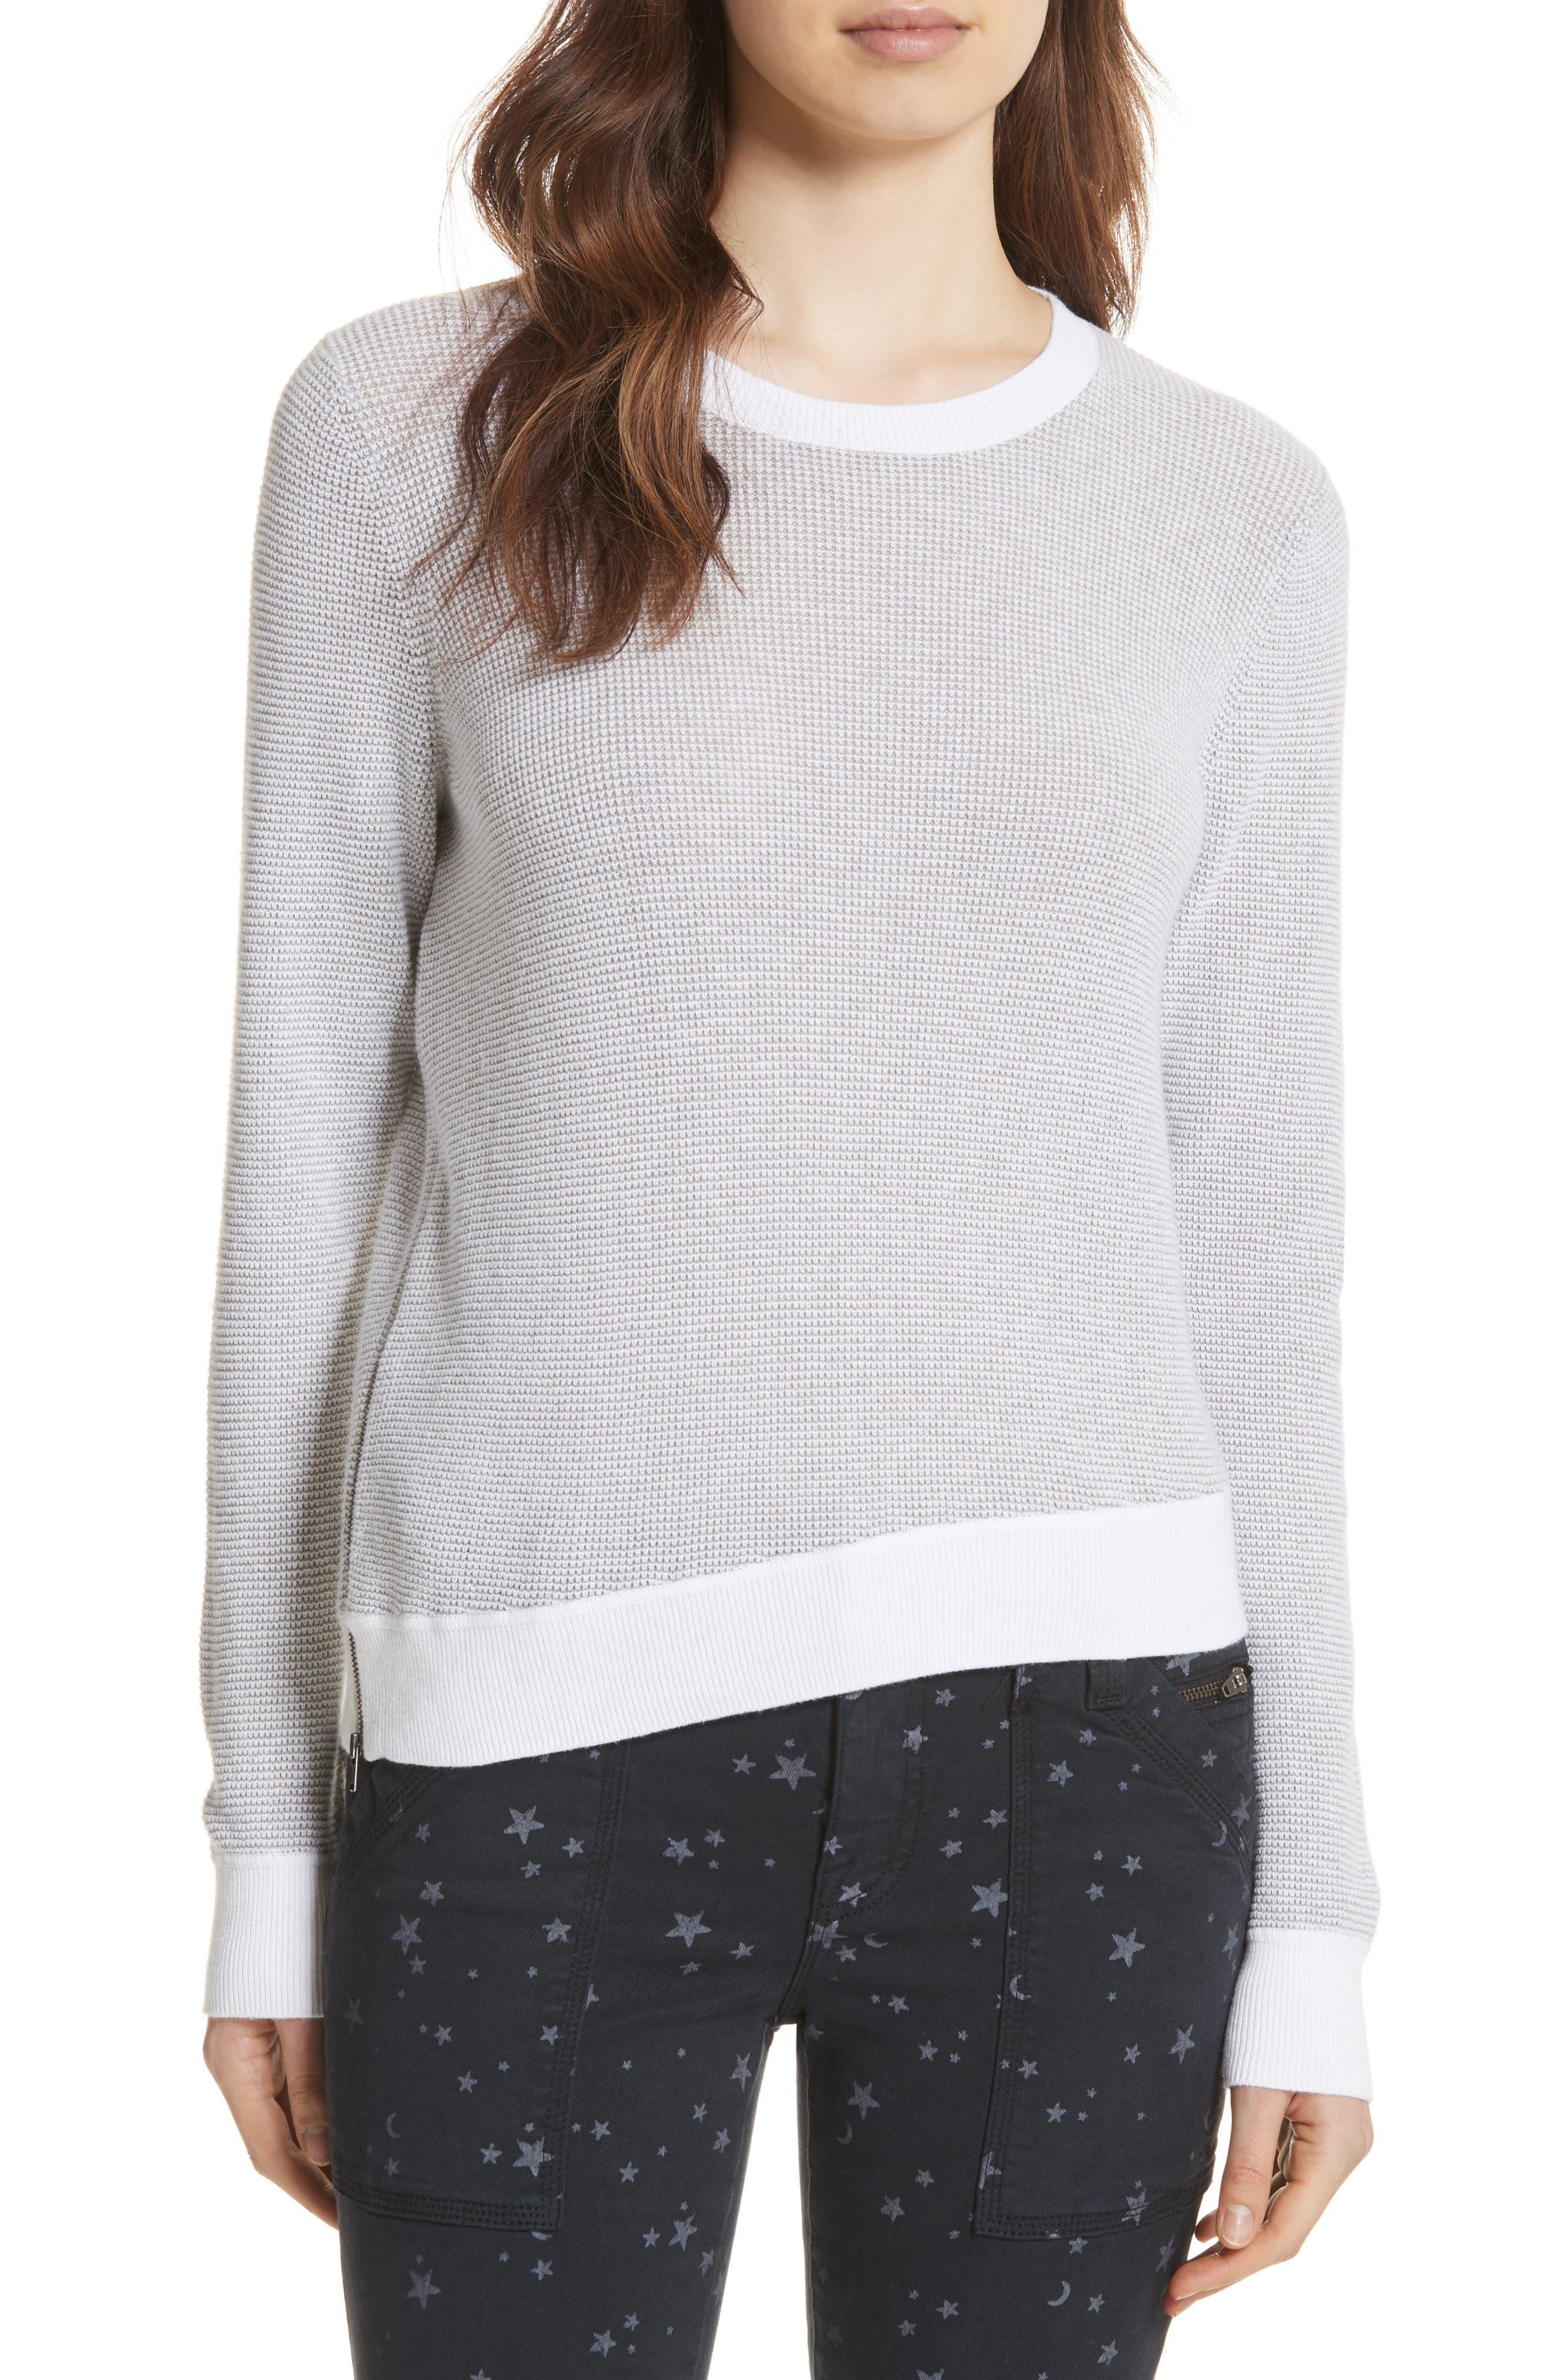 Joie Laurana Cotton & Cashmere Sweater